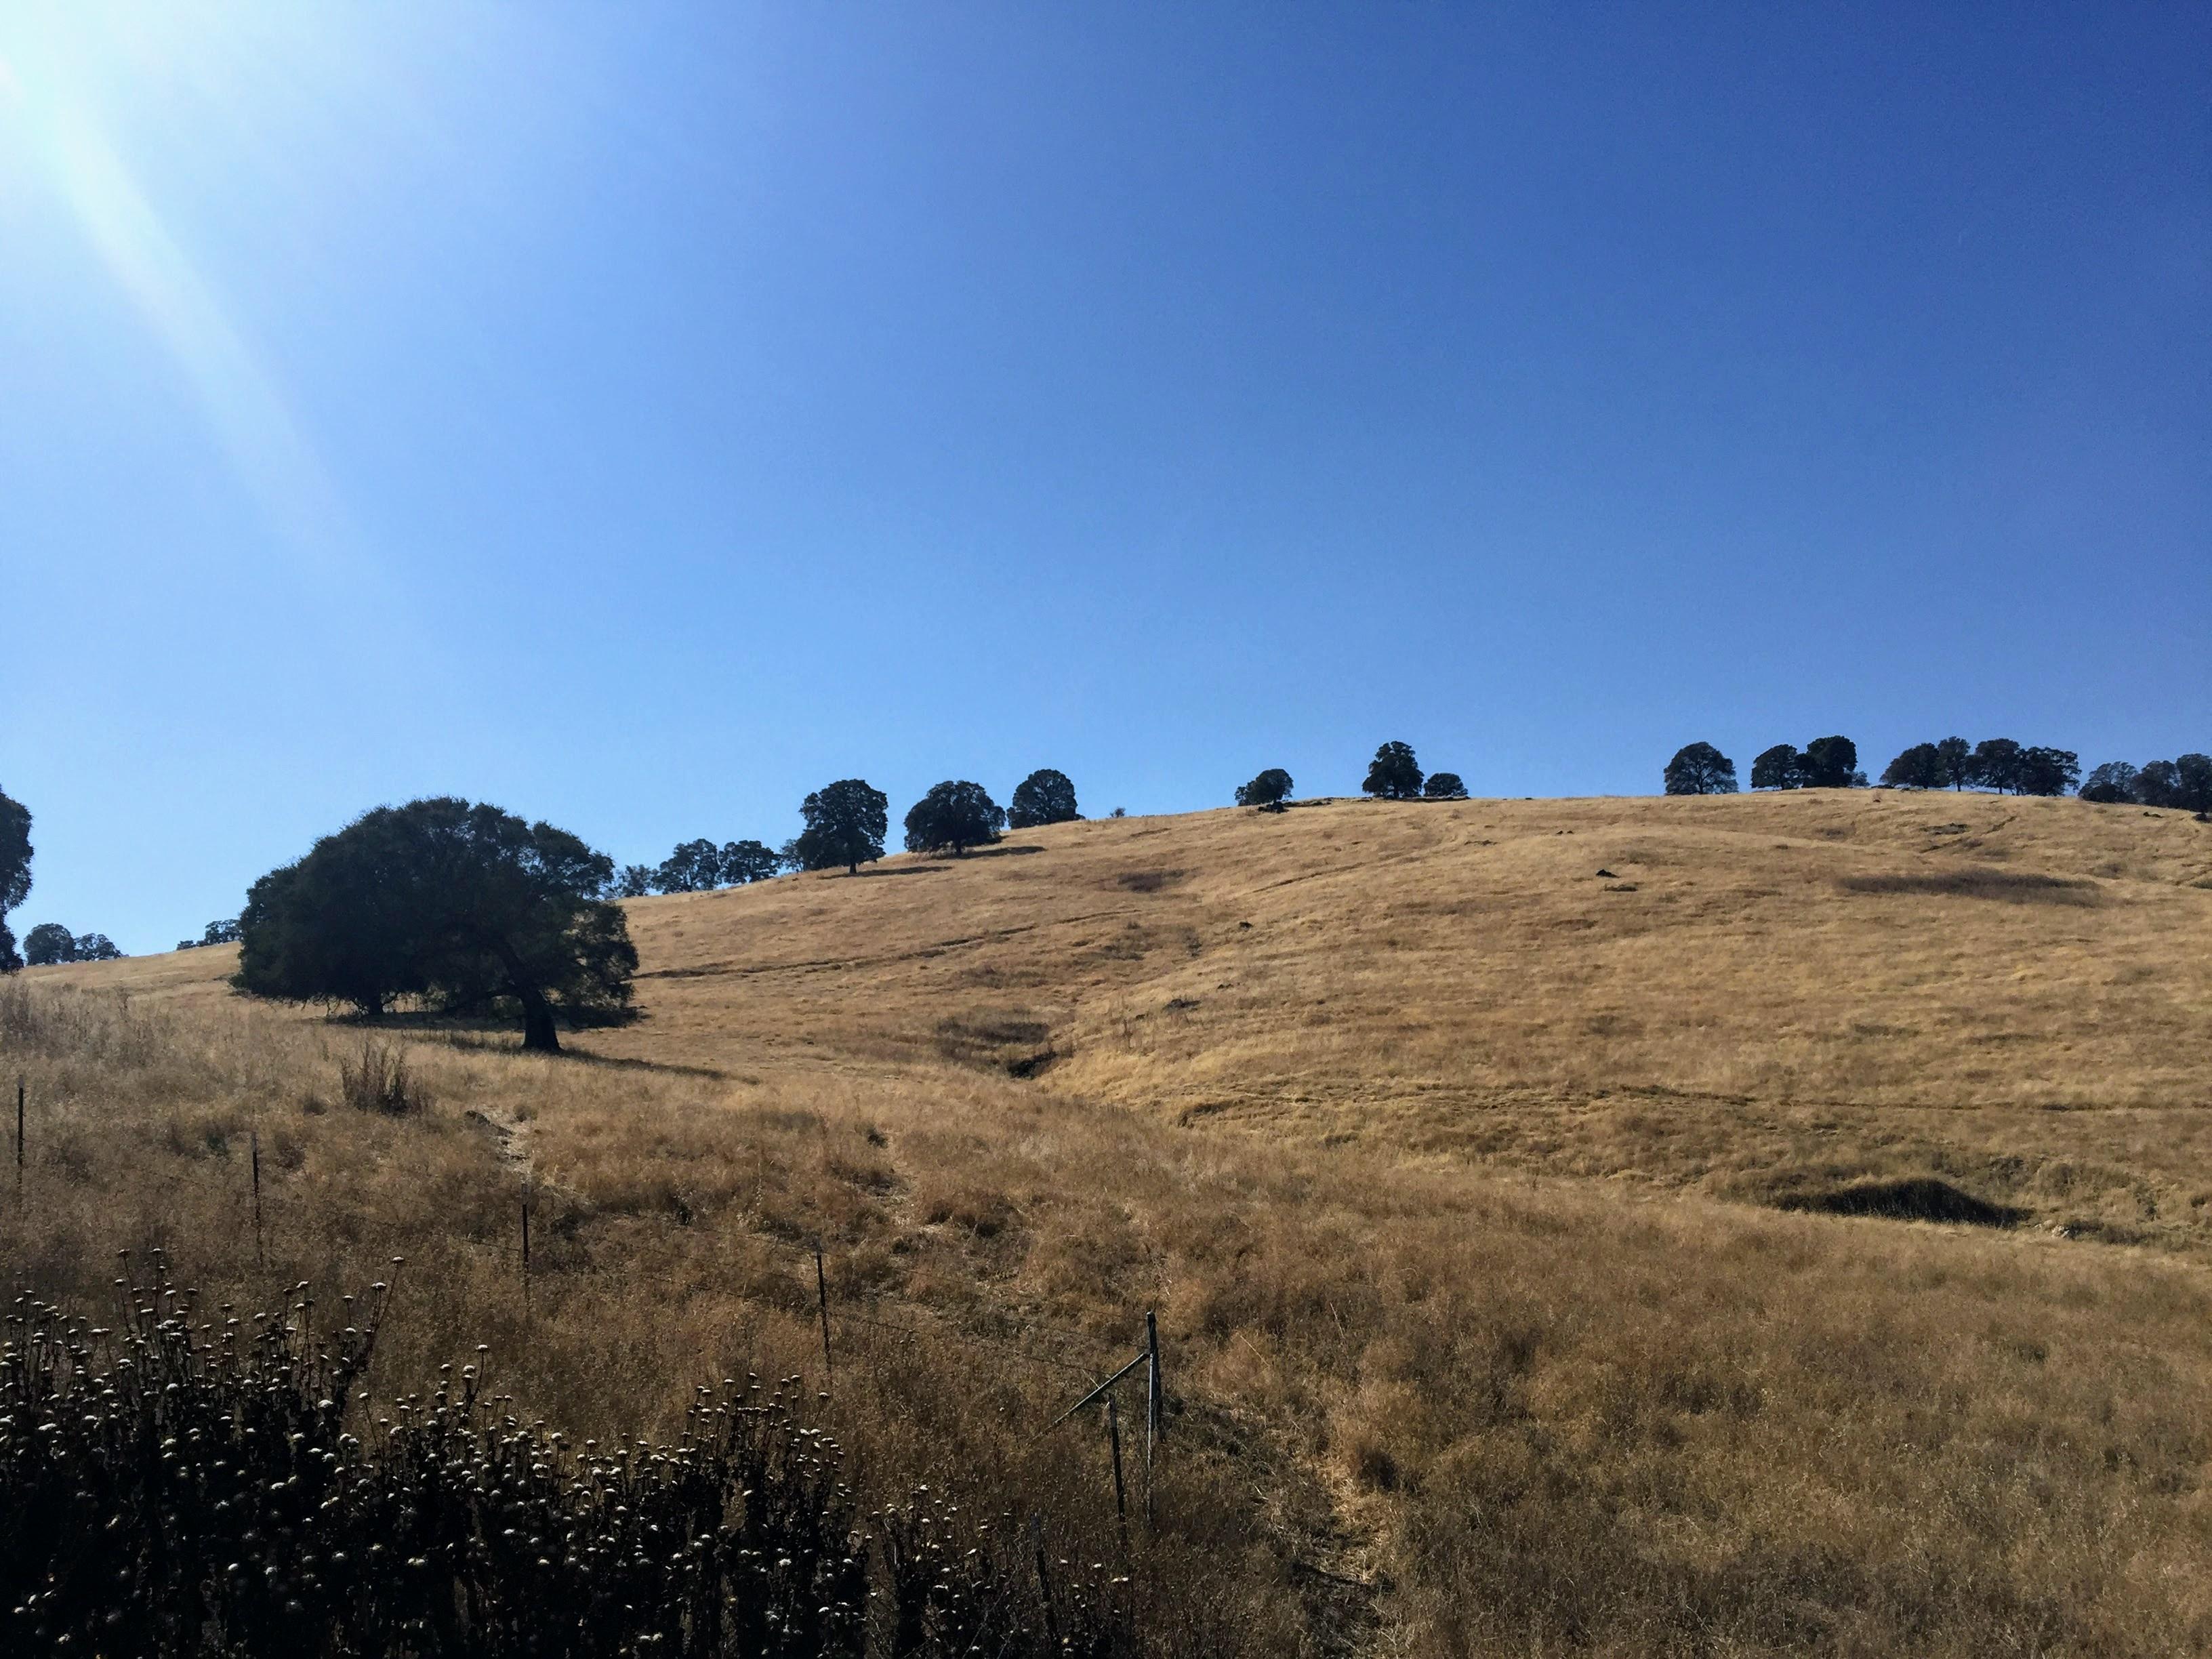 2017-10-14 California 01 Views 03